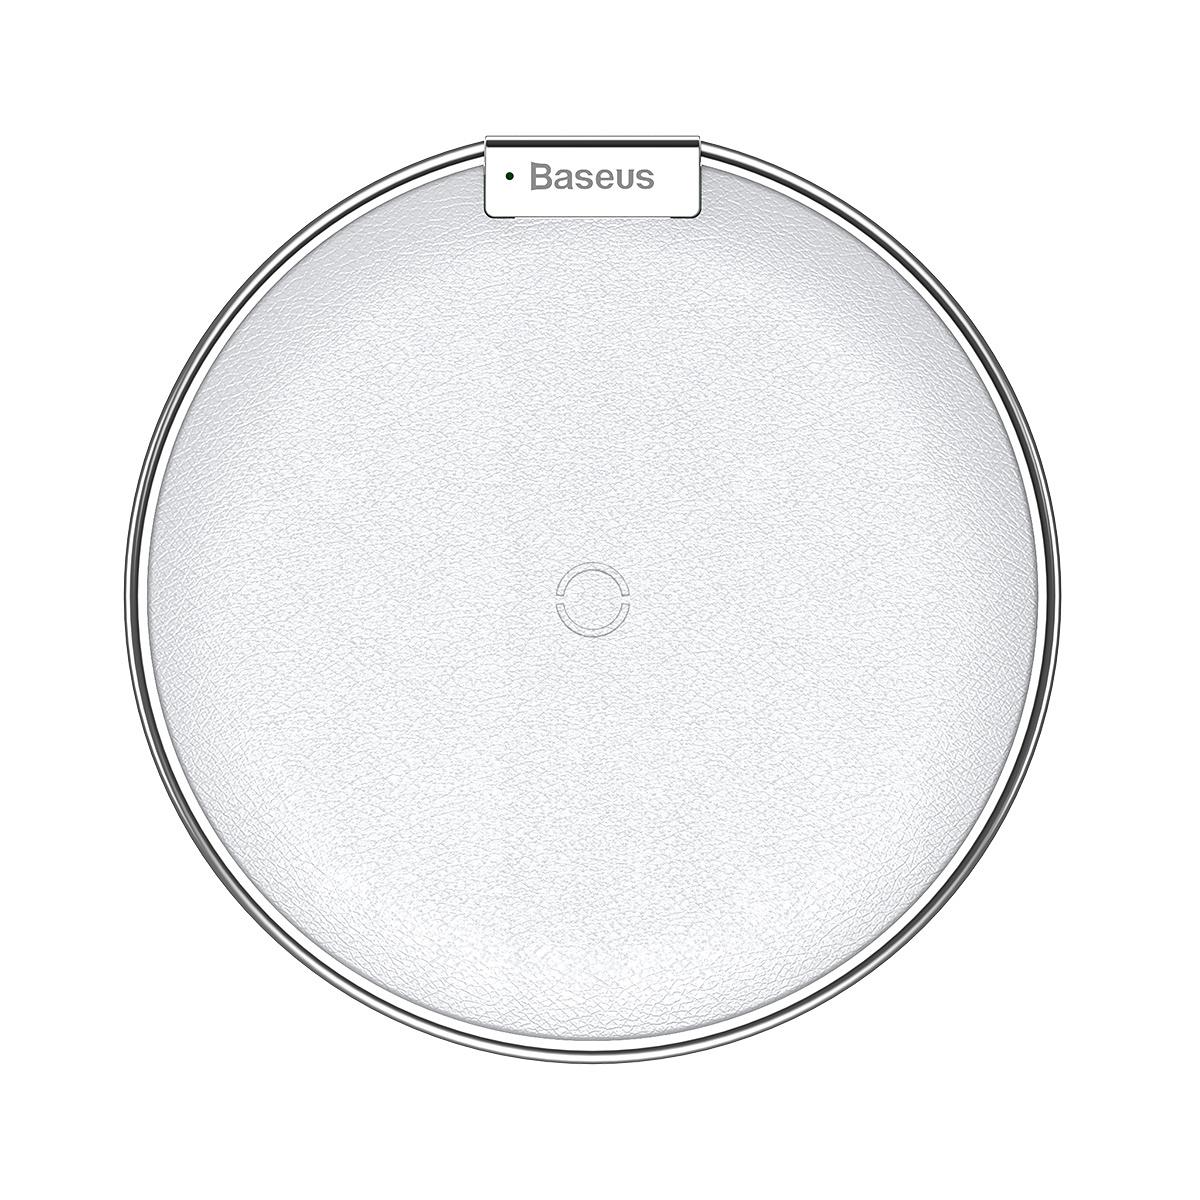 Baseus iX Trådlös mobilladdare, intelligent, silver